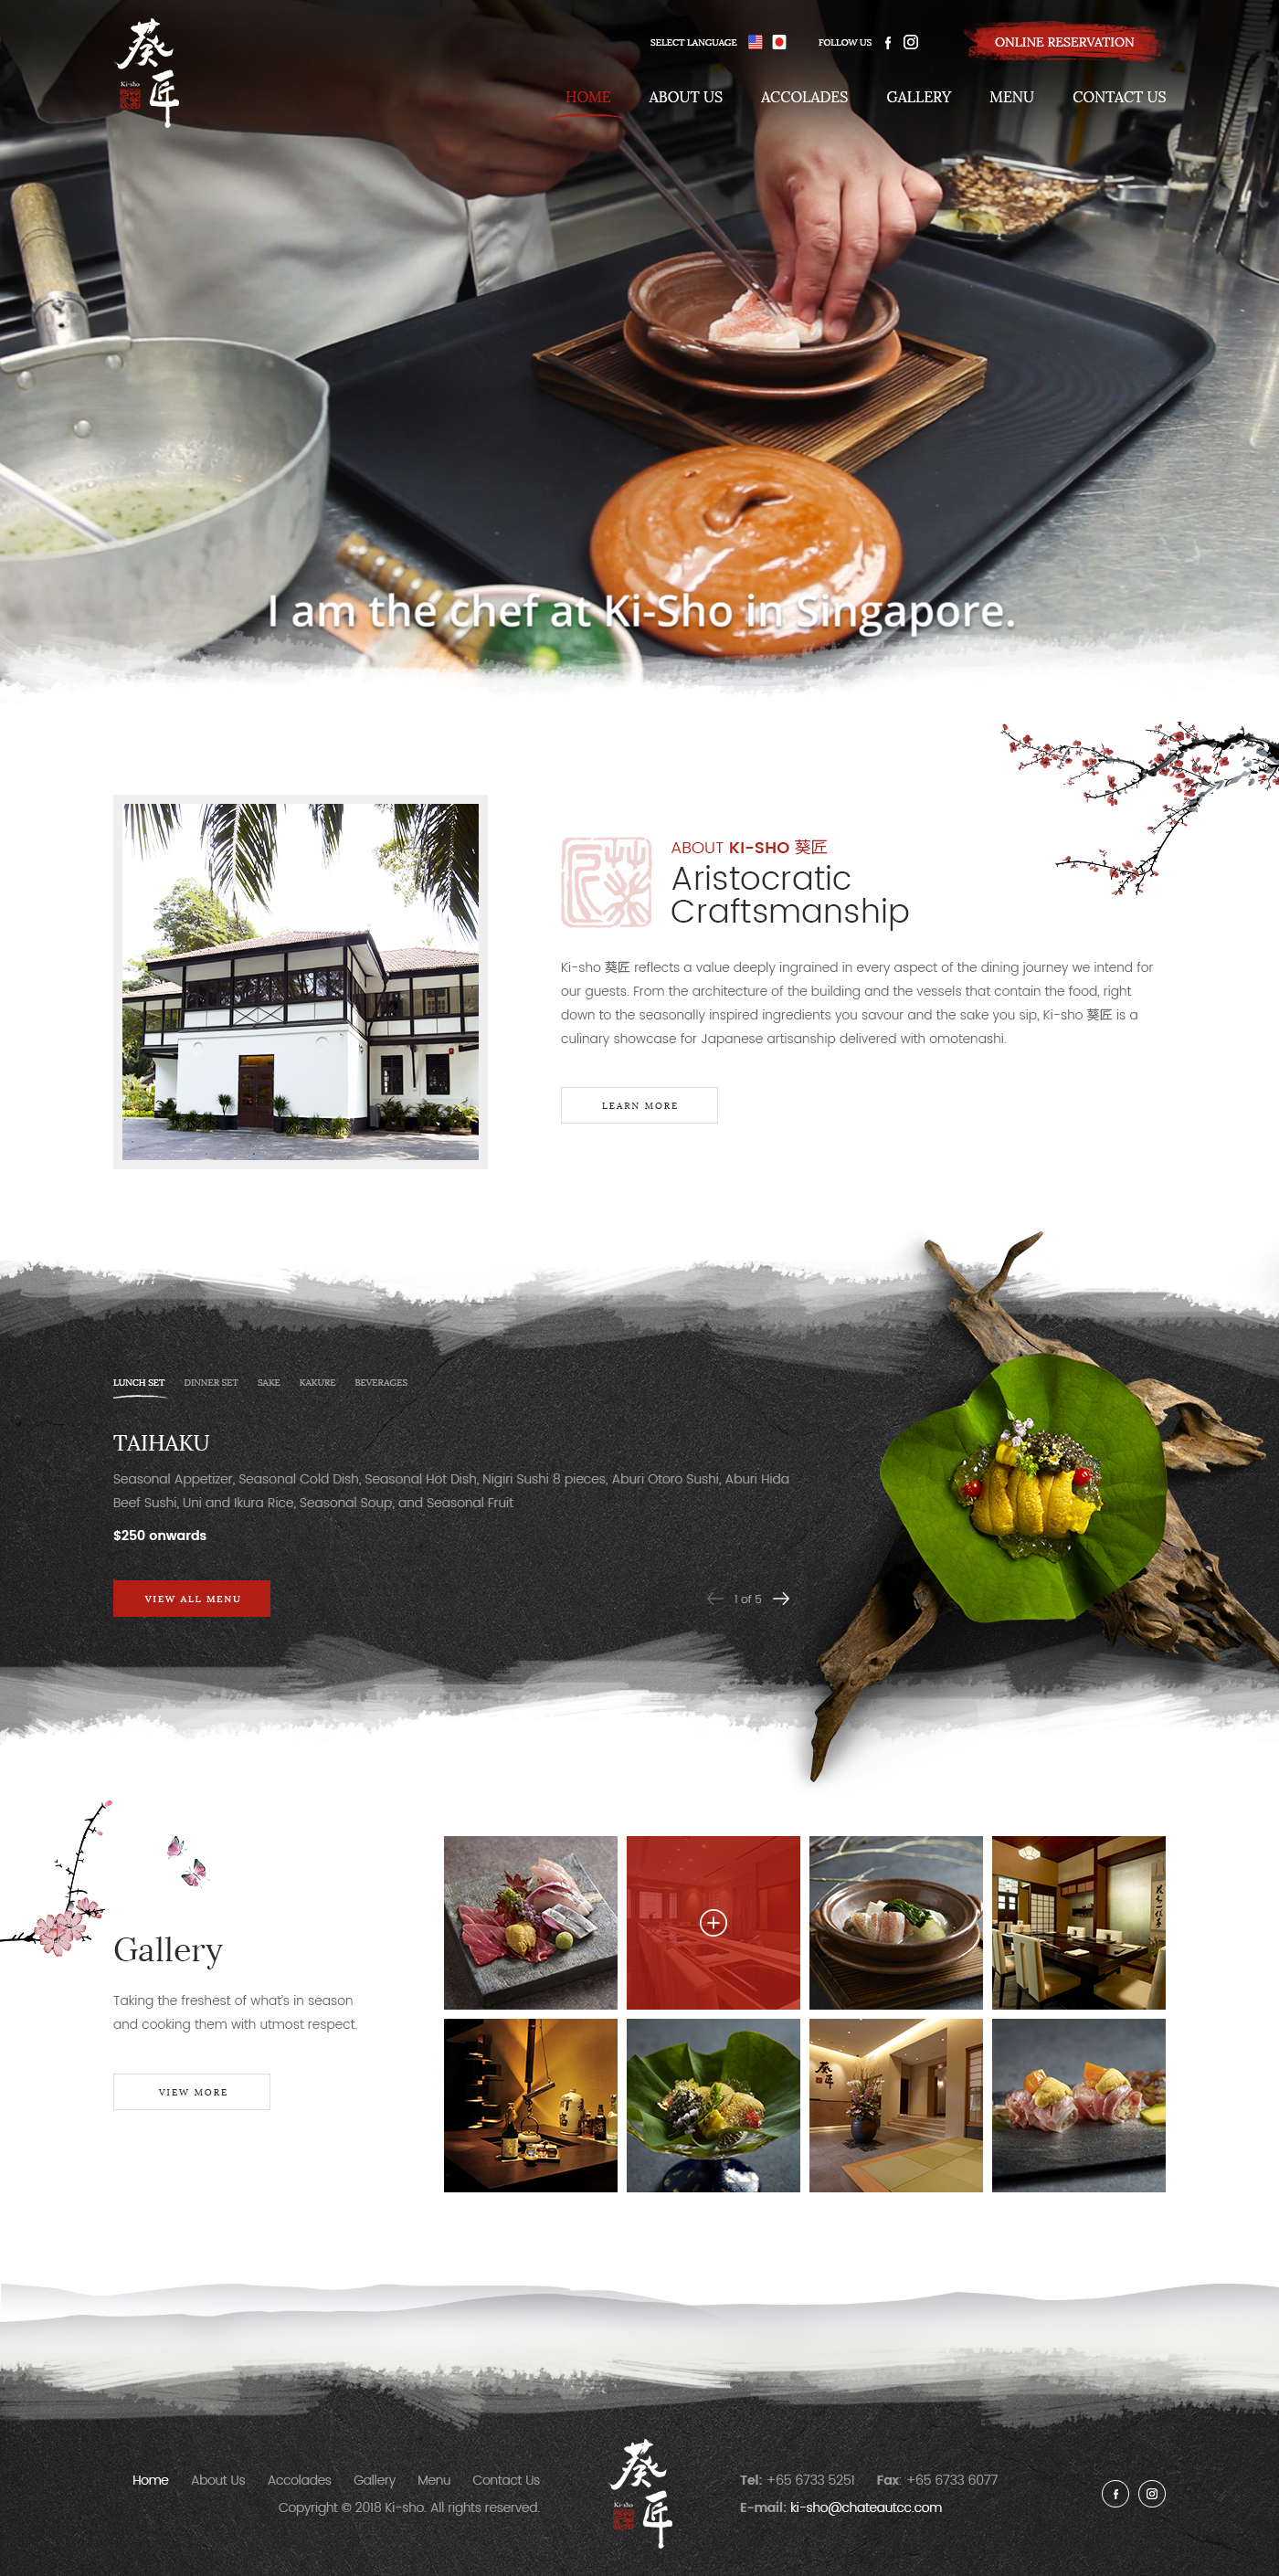 Ki Sho Web Design Philippines Website Design Web Development Company Web Design Philippines Website Design Web Development Company